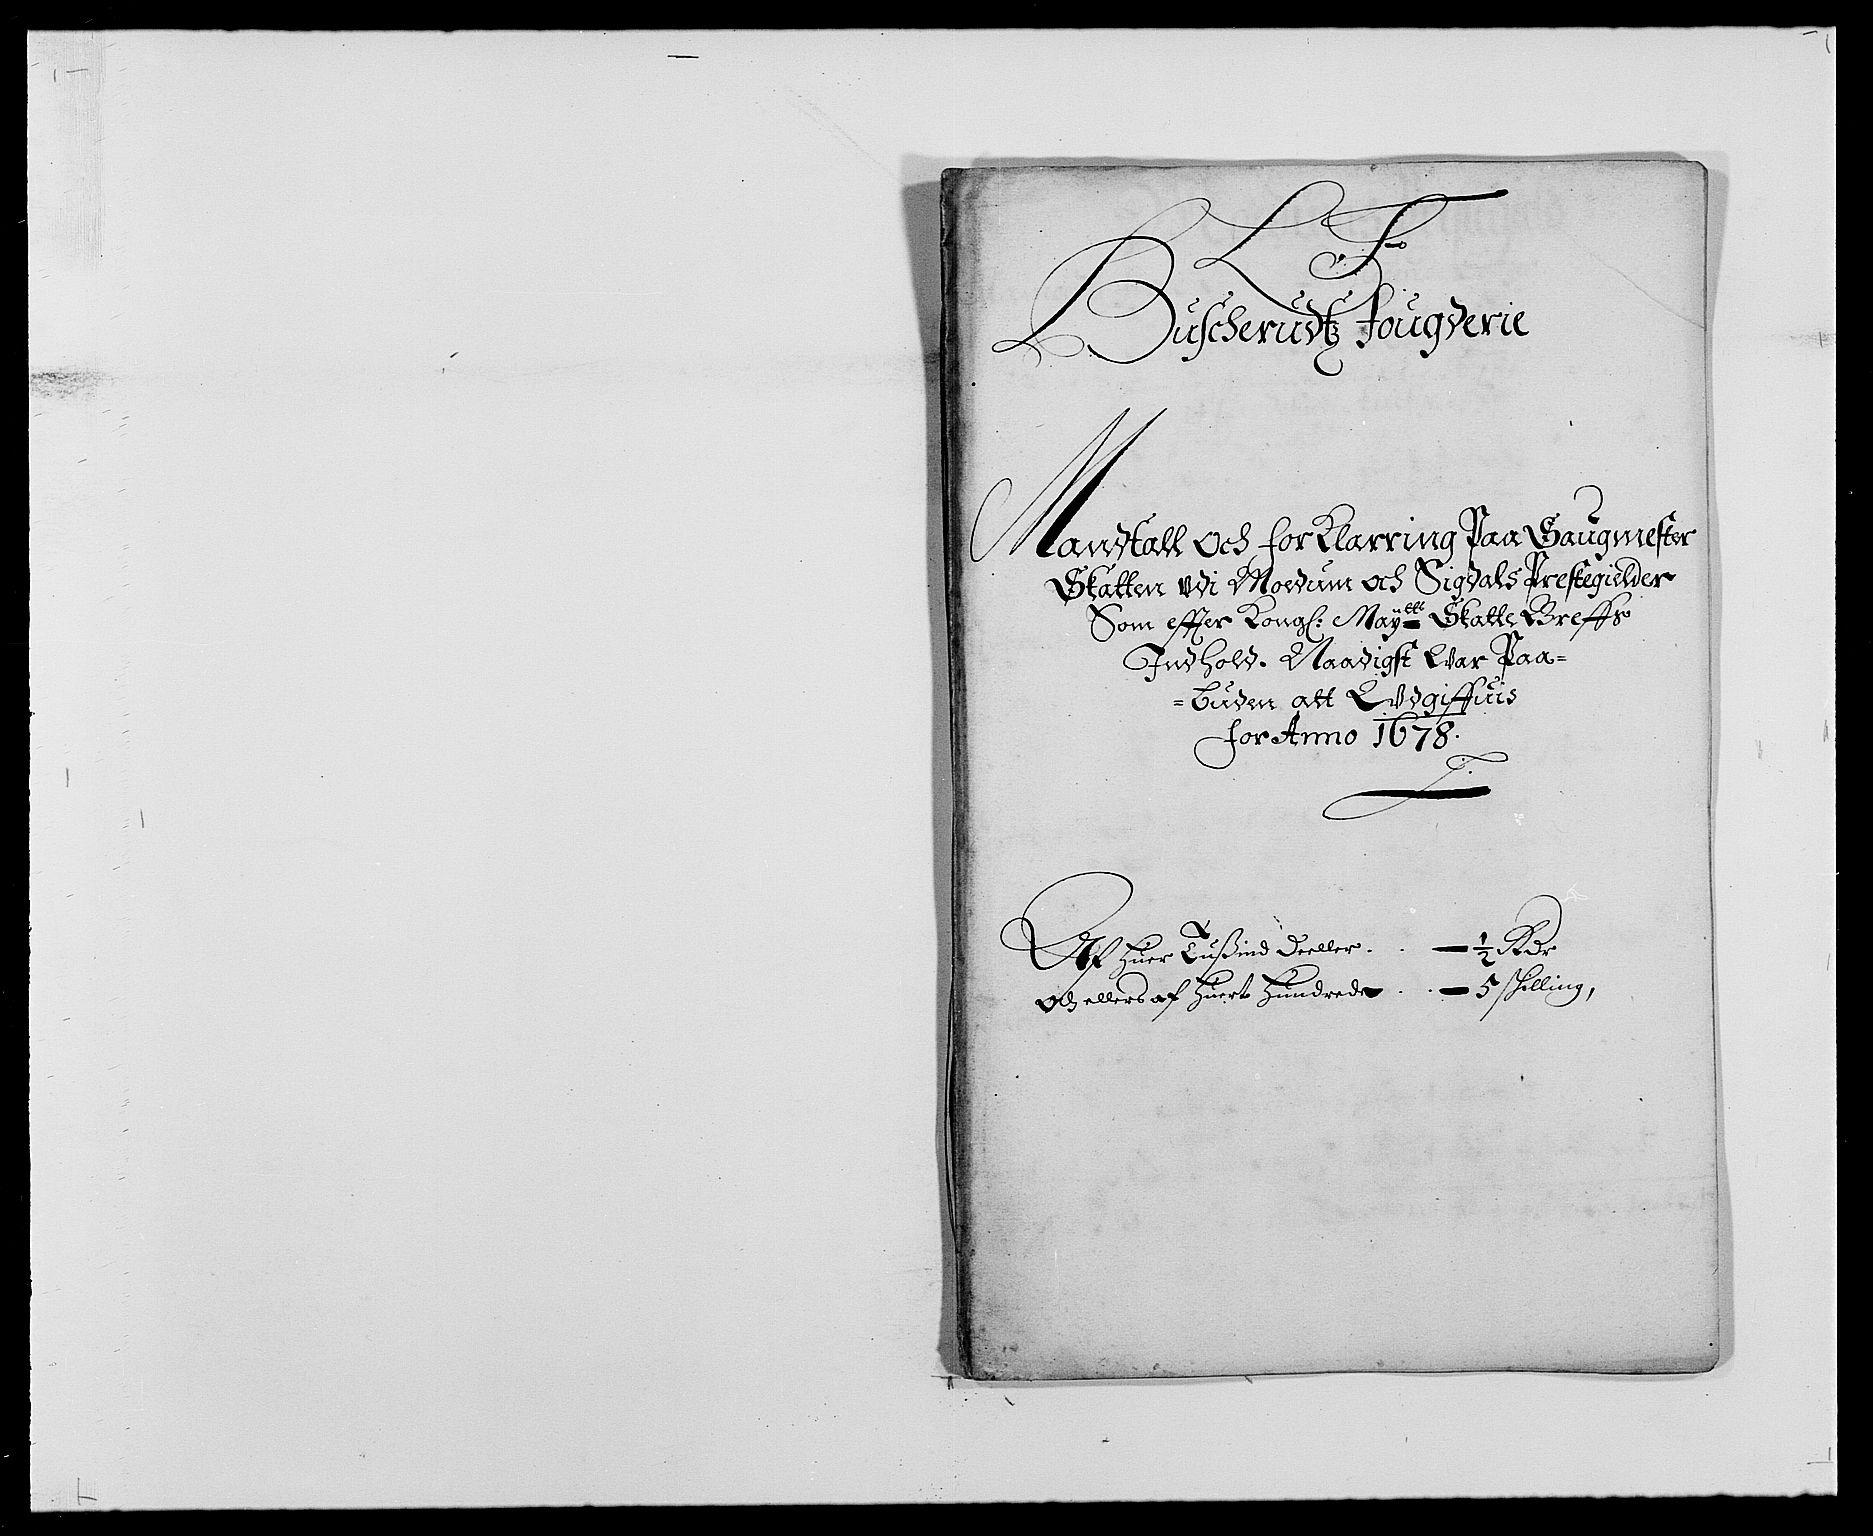 RA, Rentekammeret inntil 1814, Reviderte regnskaper, Fogderegnskap, R25/L1674: Fogderegnskap Buskerud, 1678-1681, s. 140